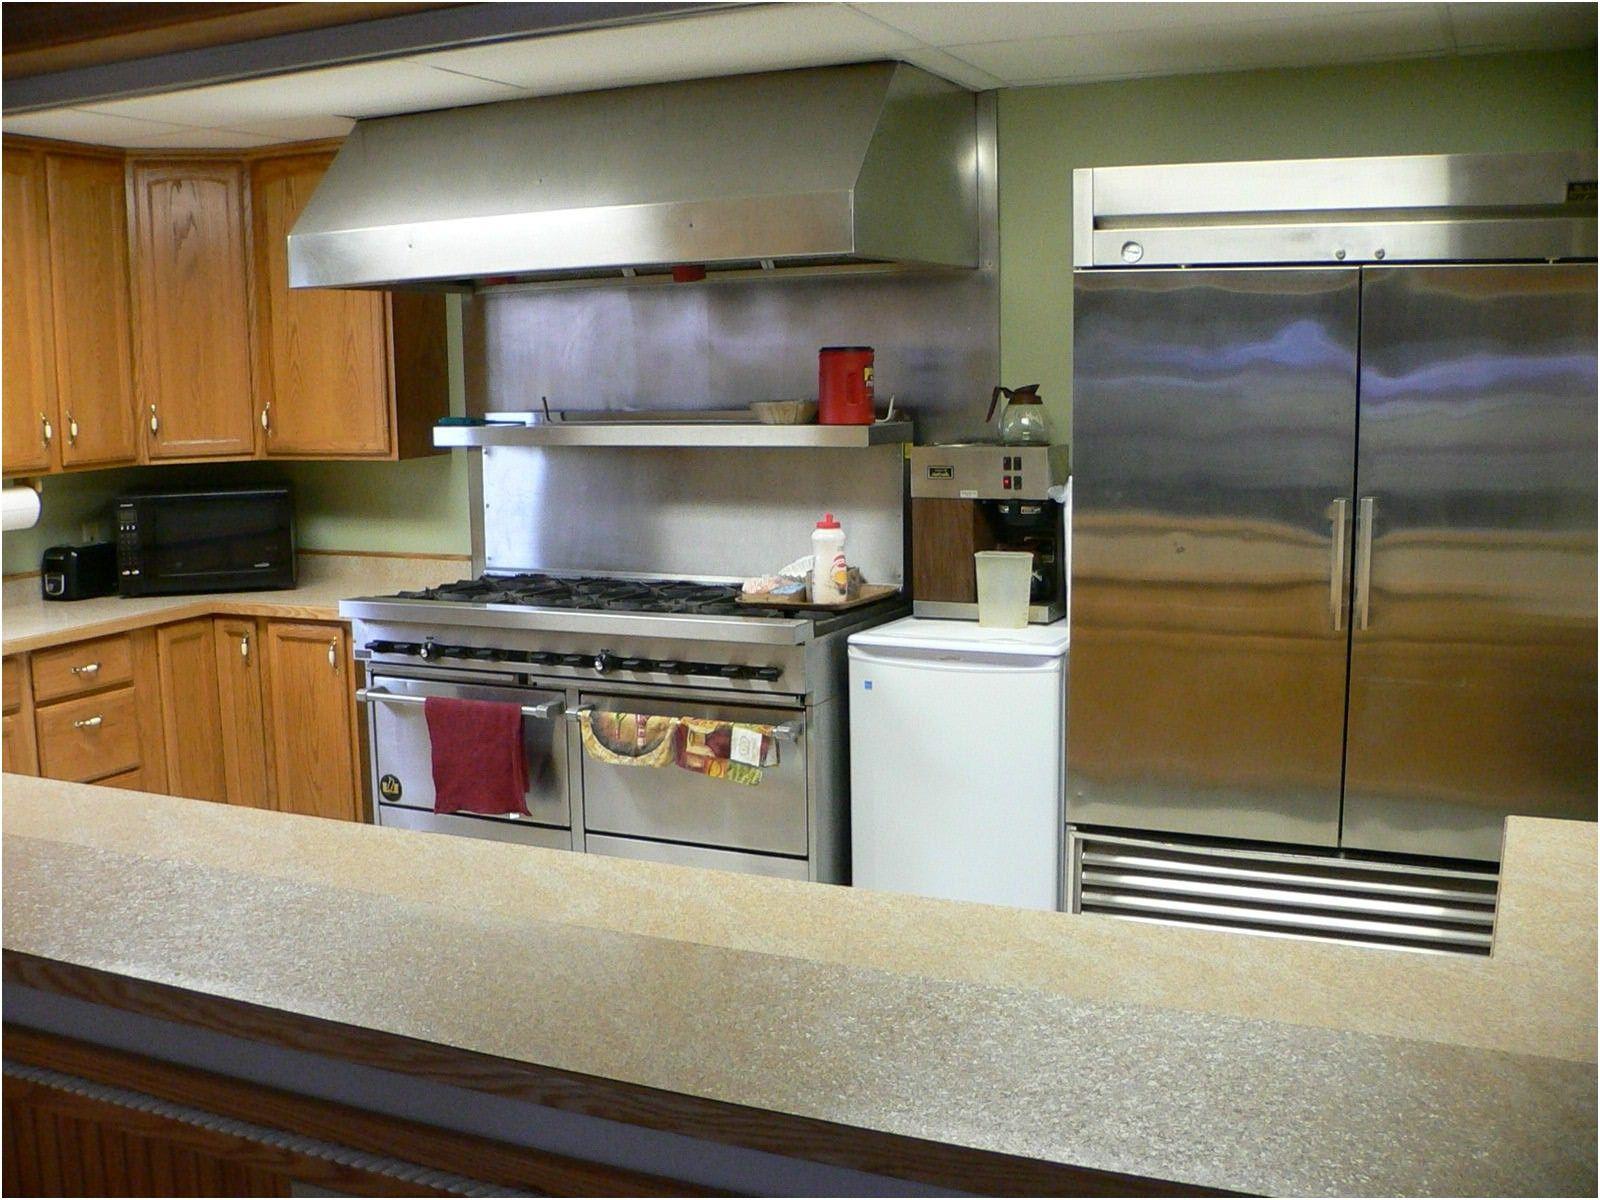 mercial kitchen appliances mercial kitchen equipment repair from ...